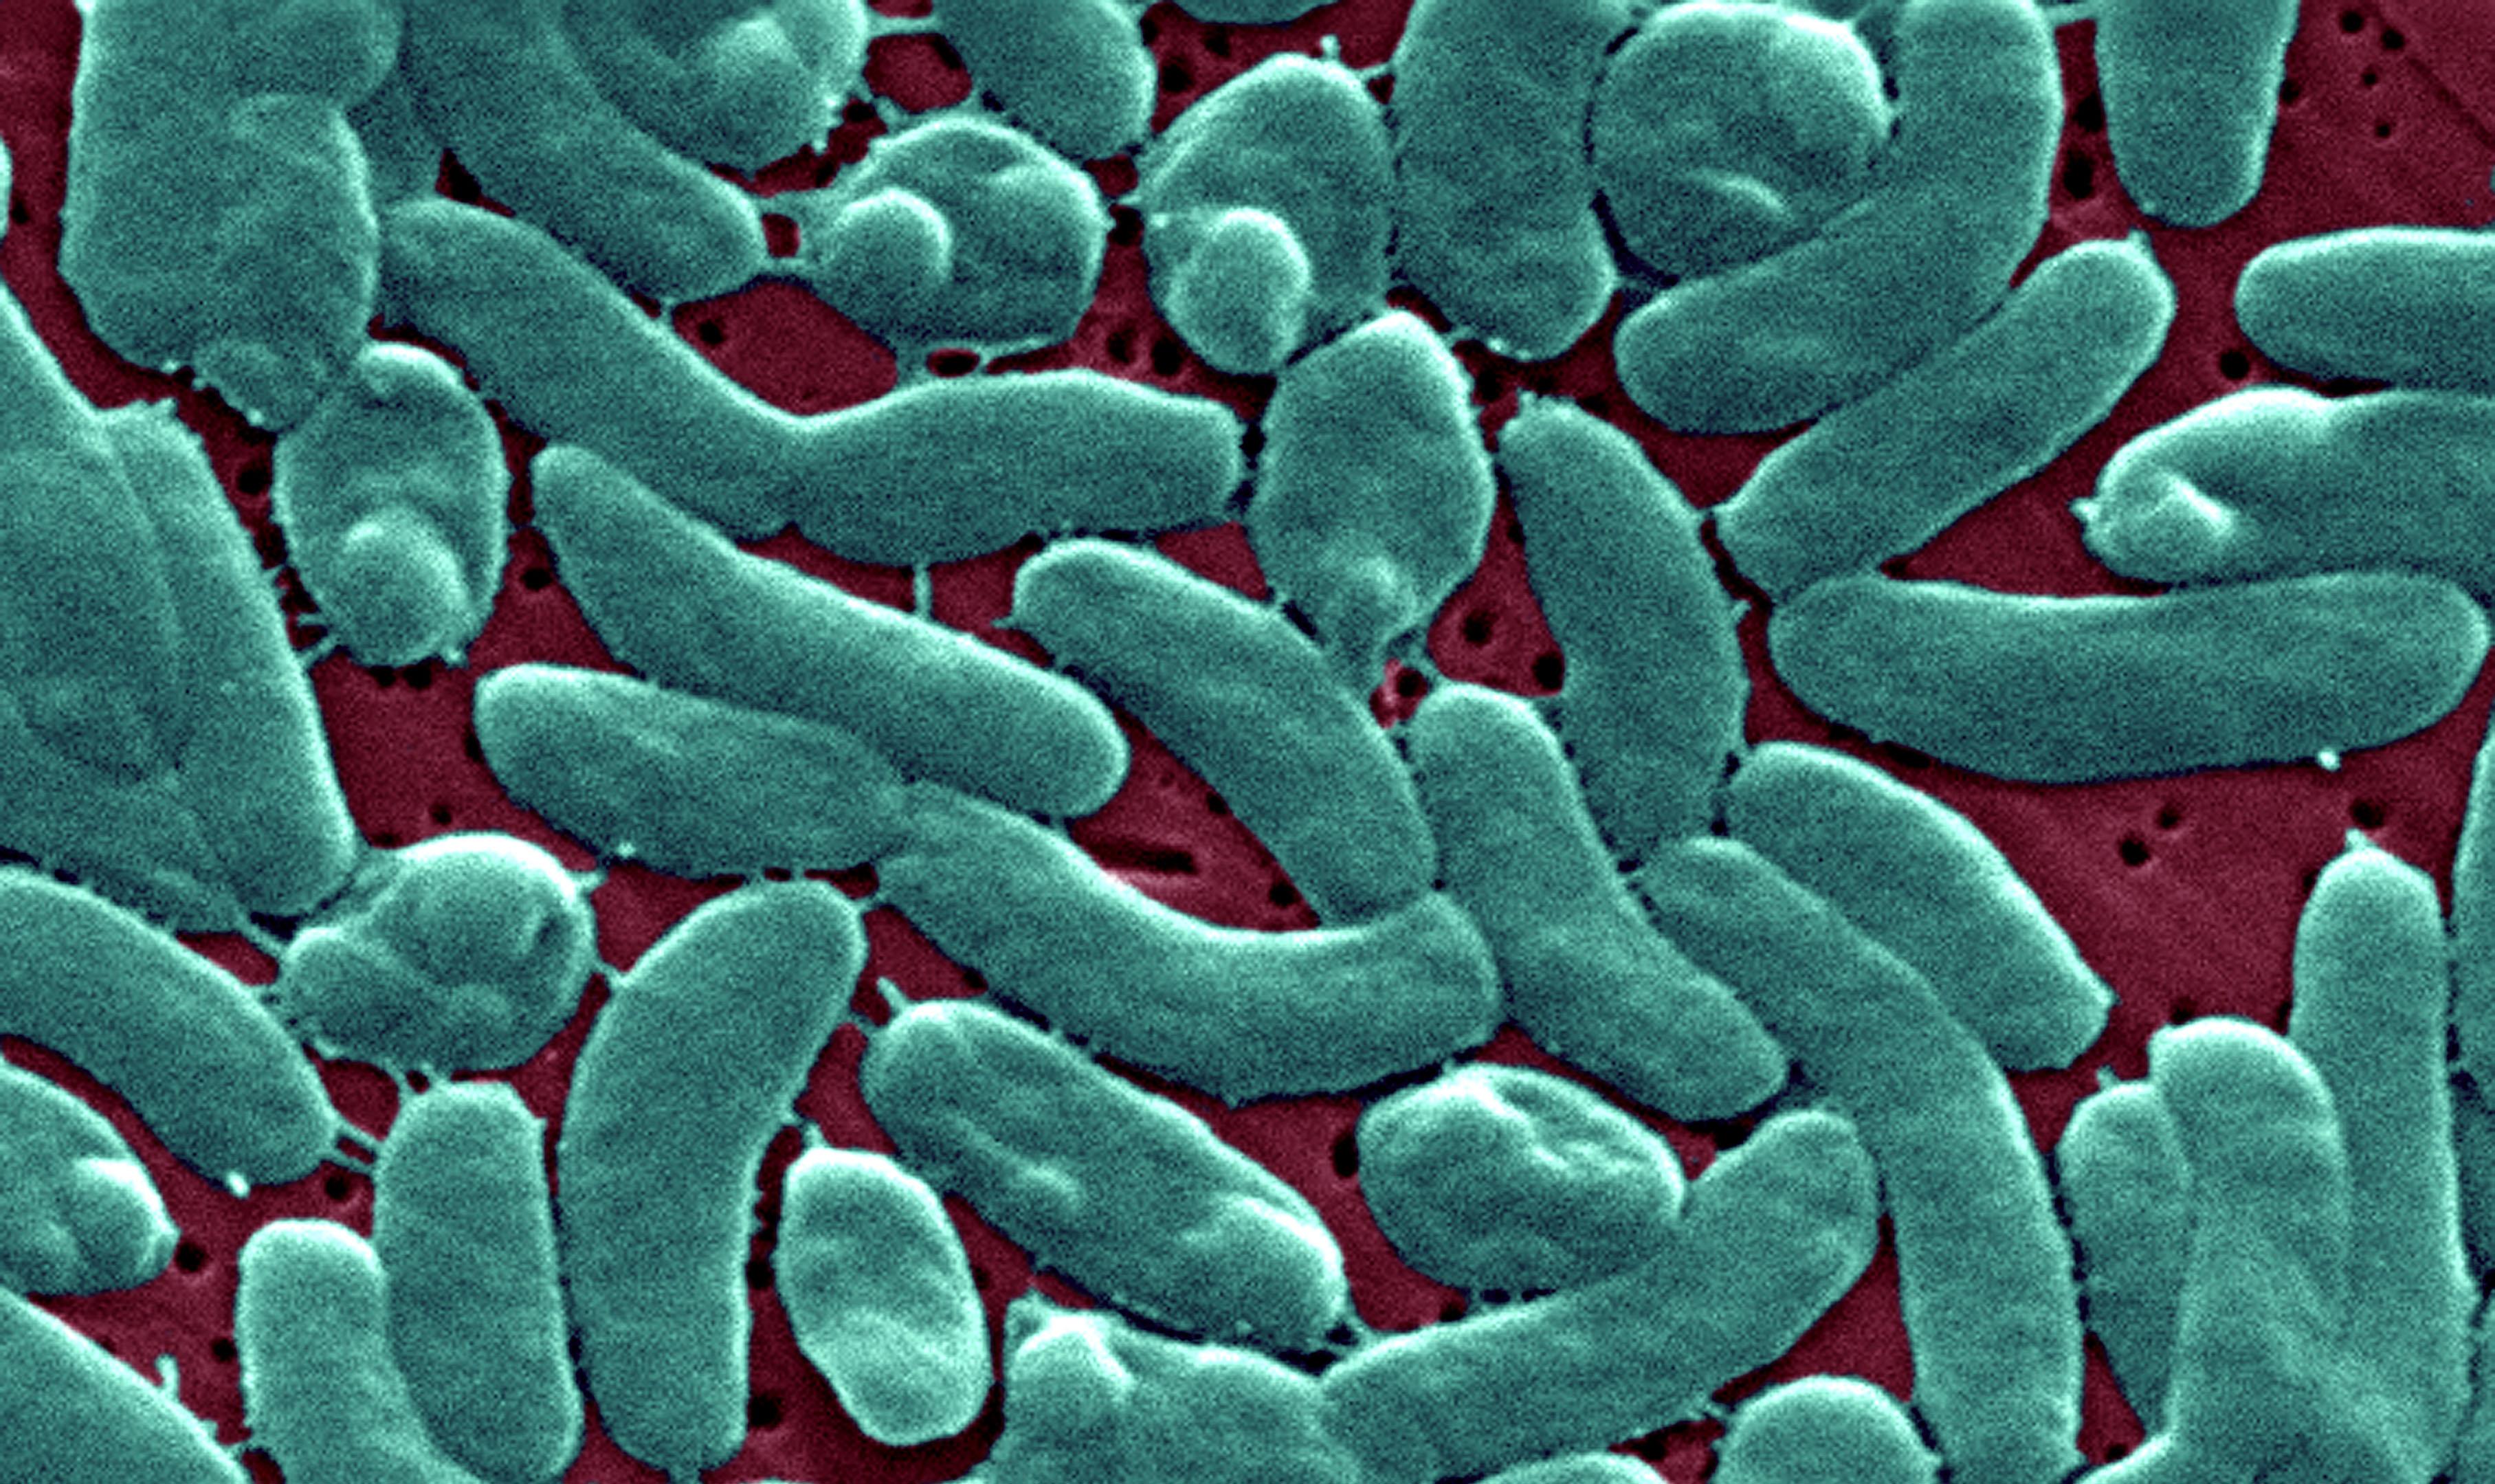 Vibrio Vulnificus bacteria